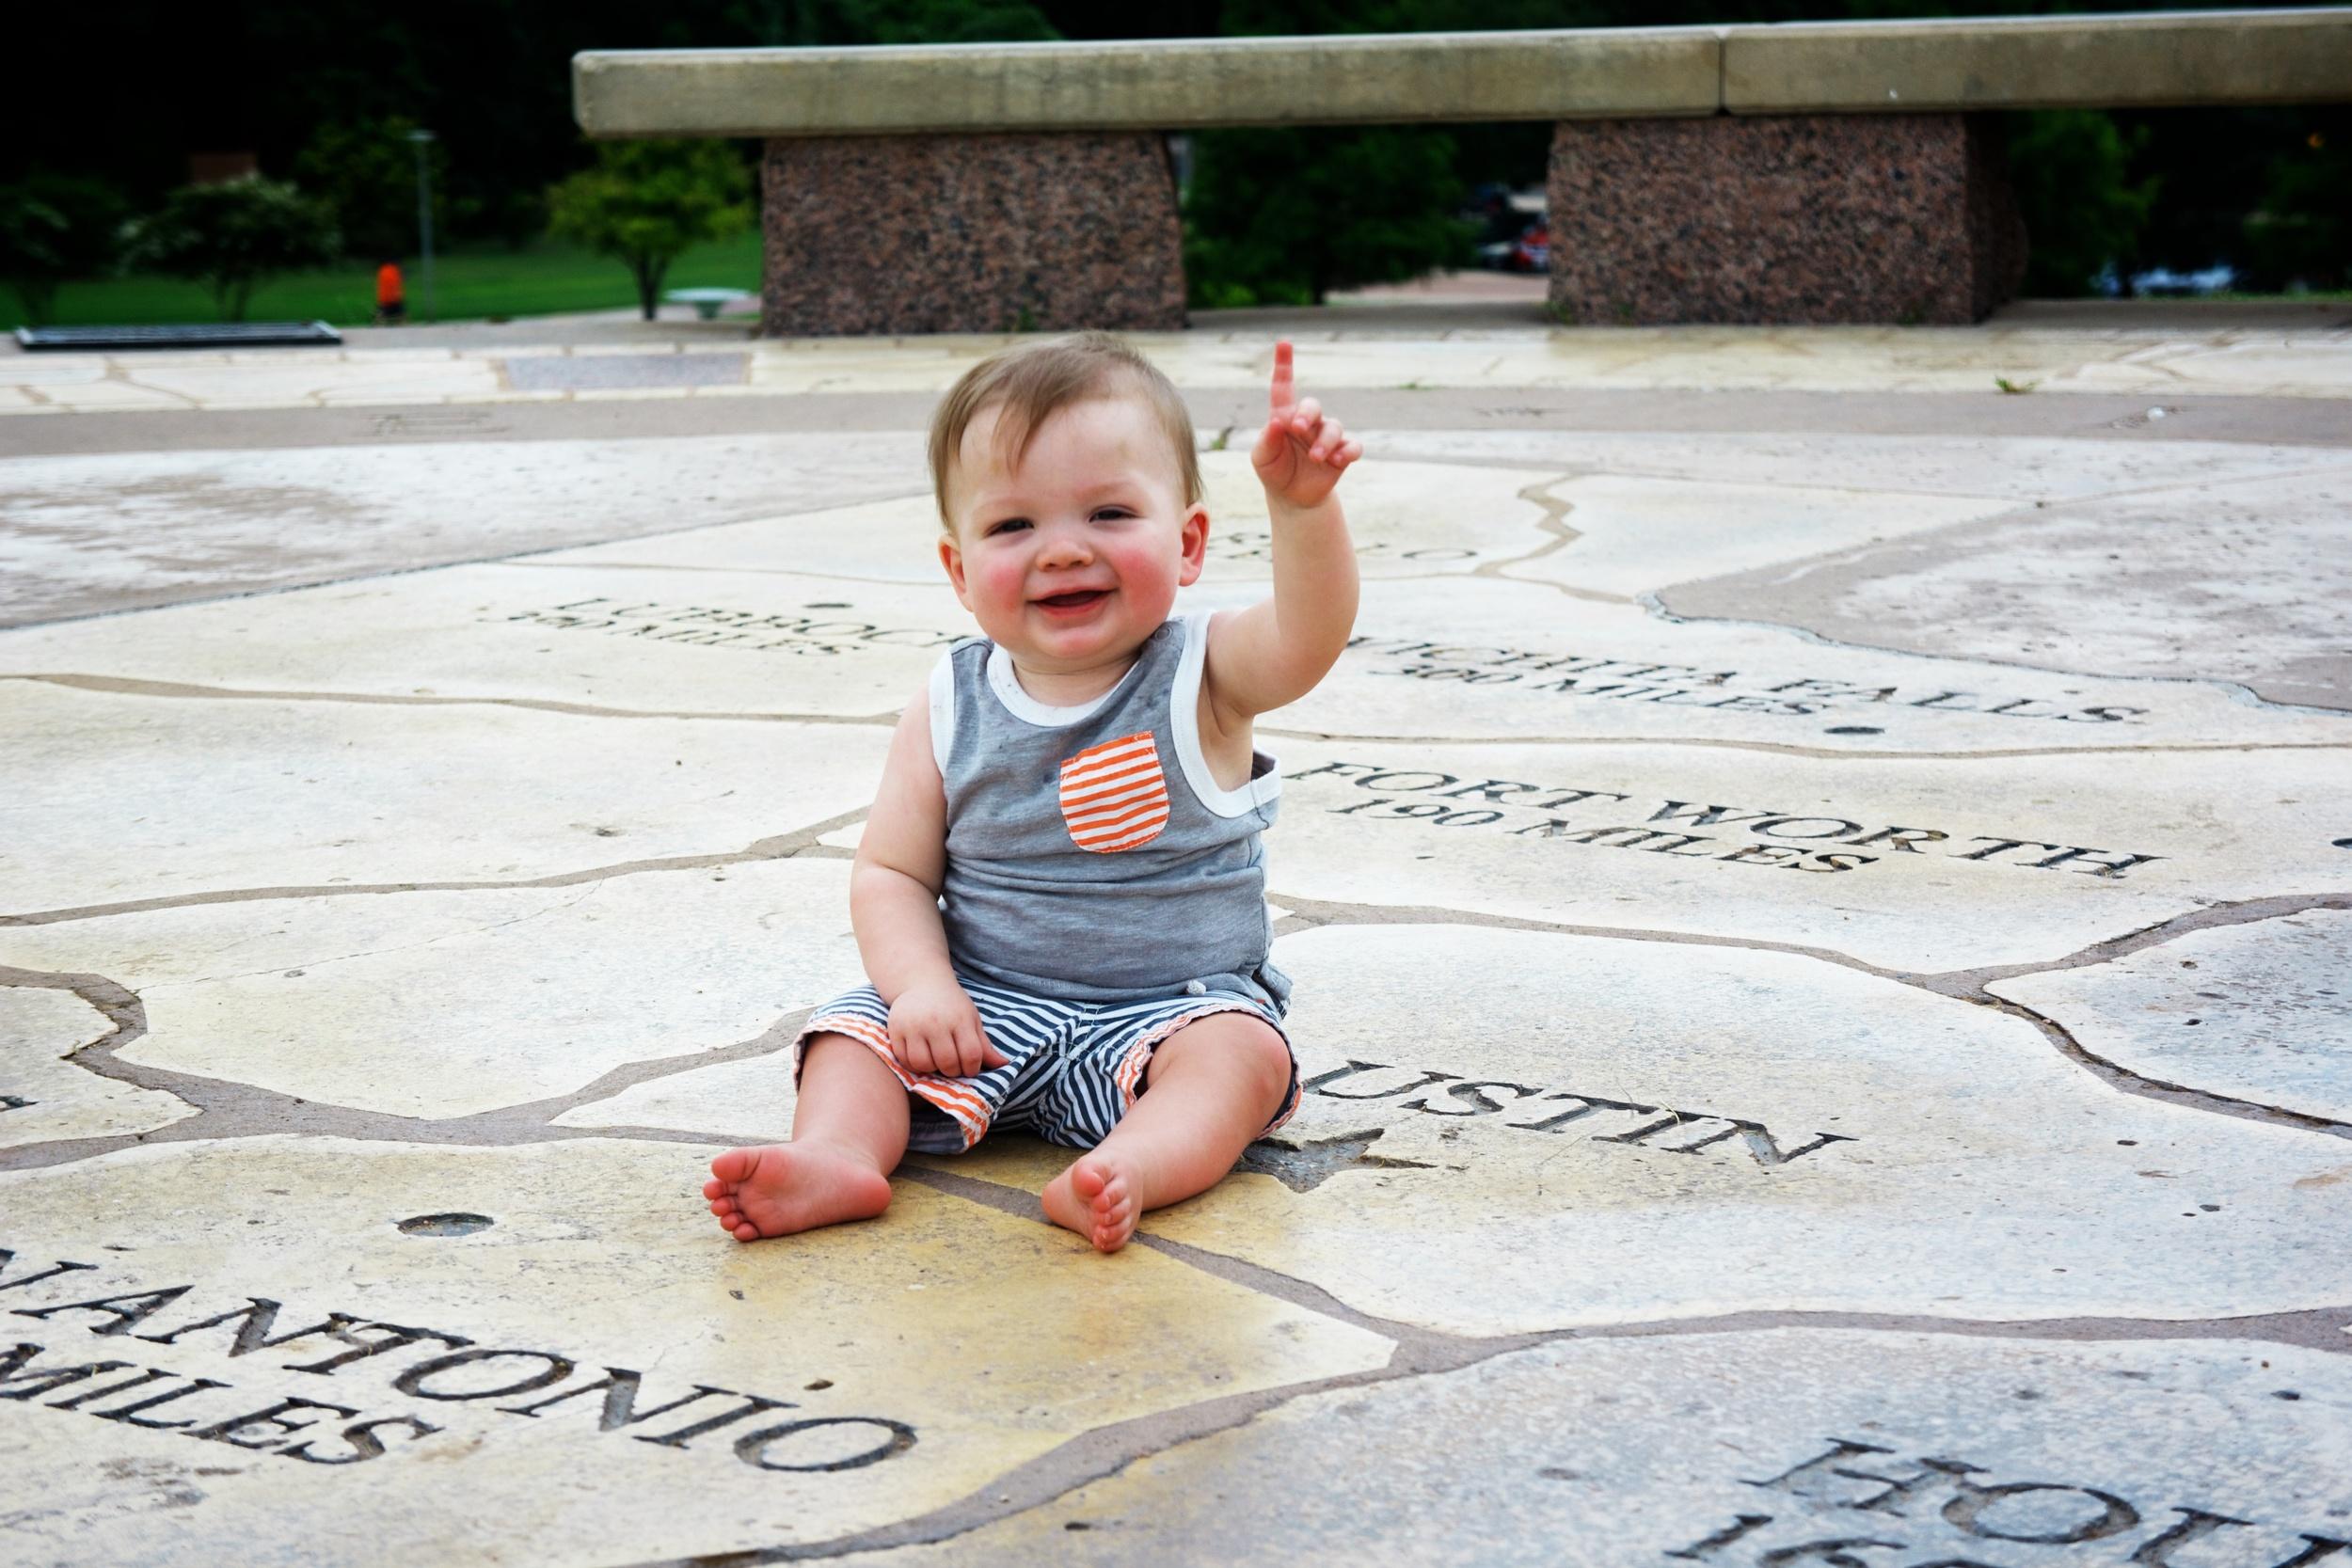 Austin_Baby 2.jpg